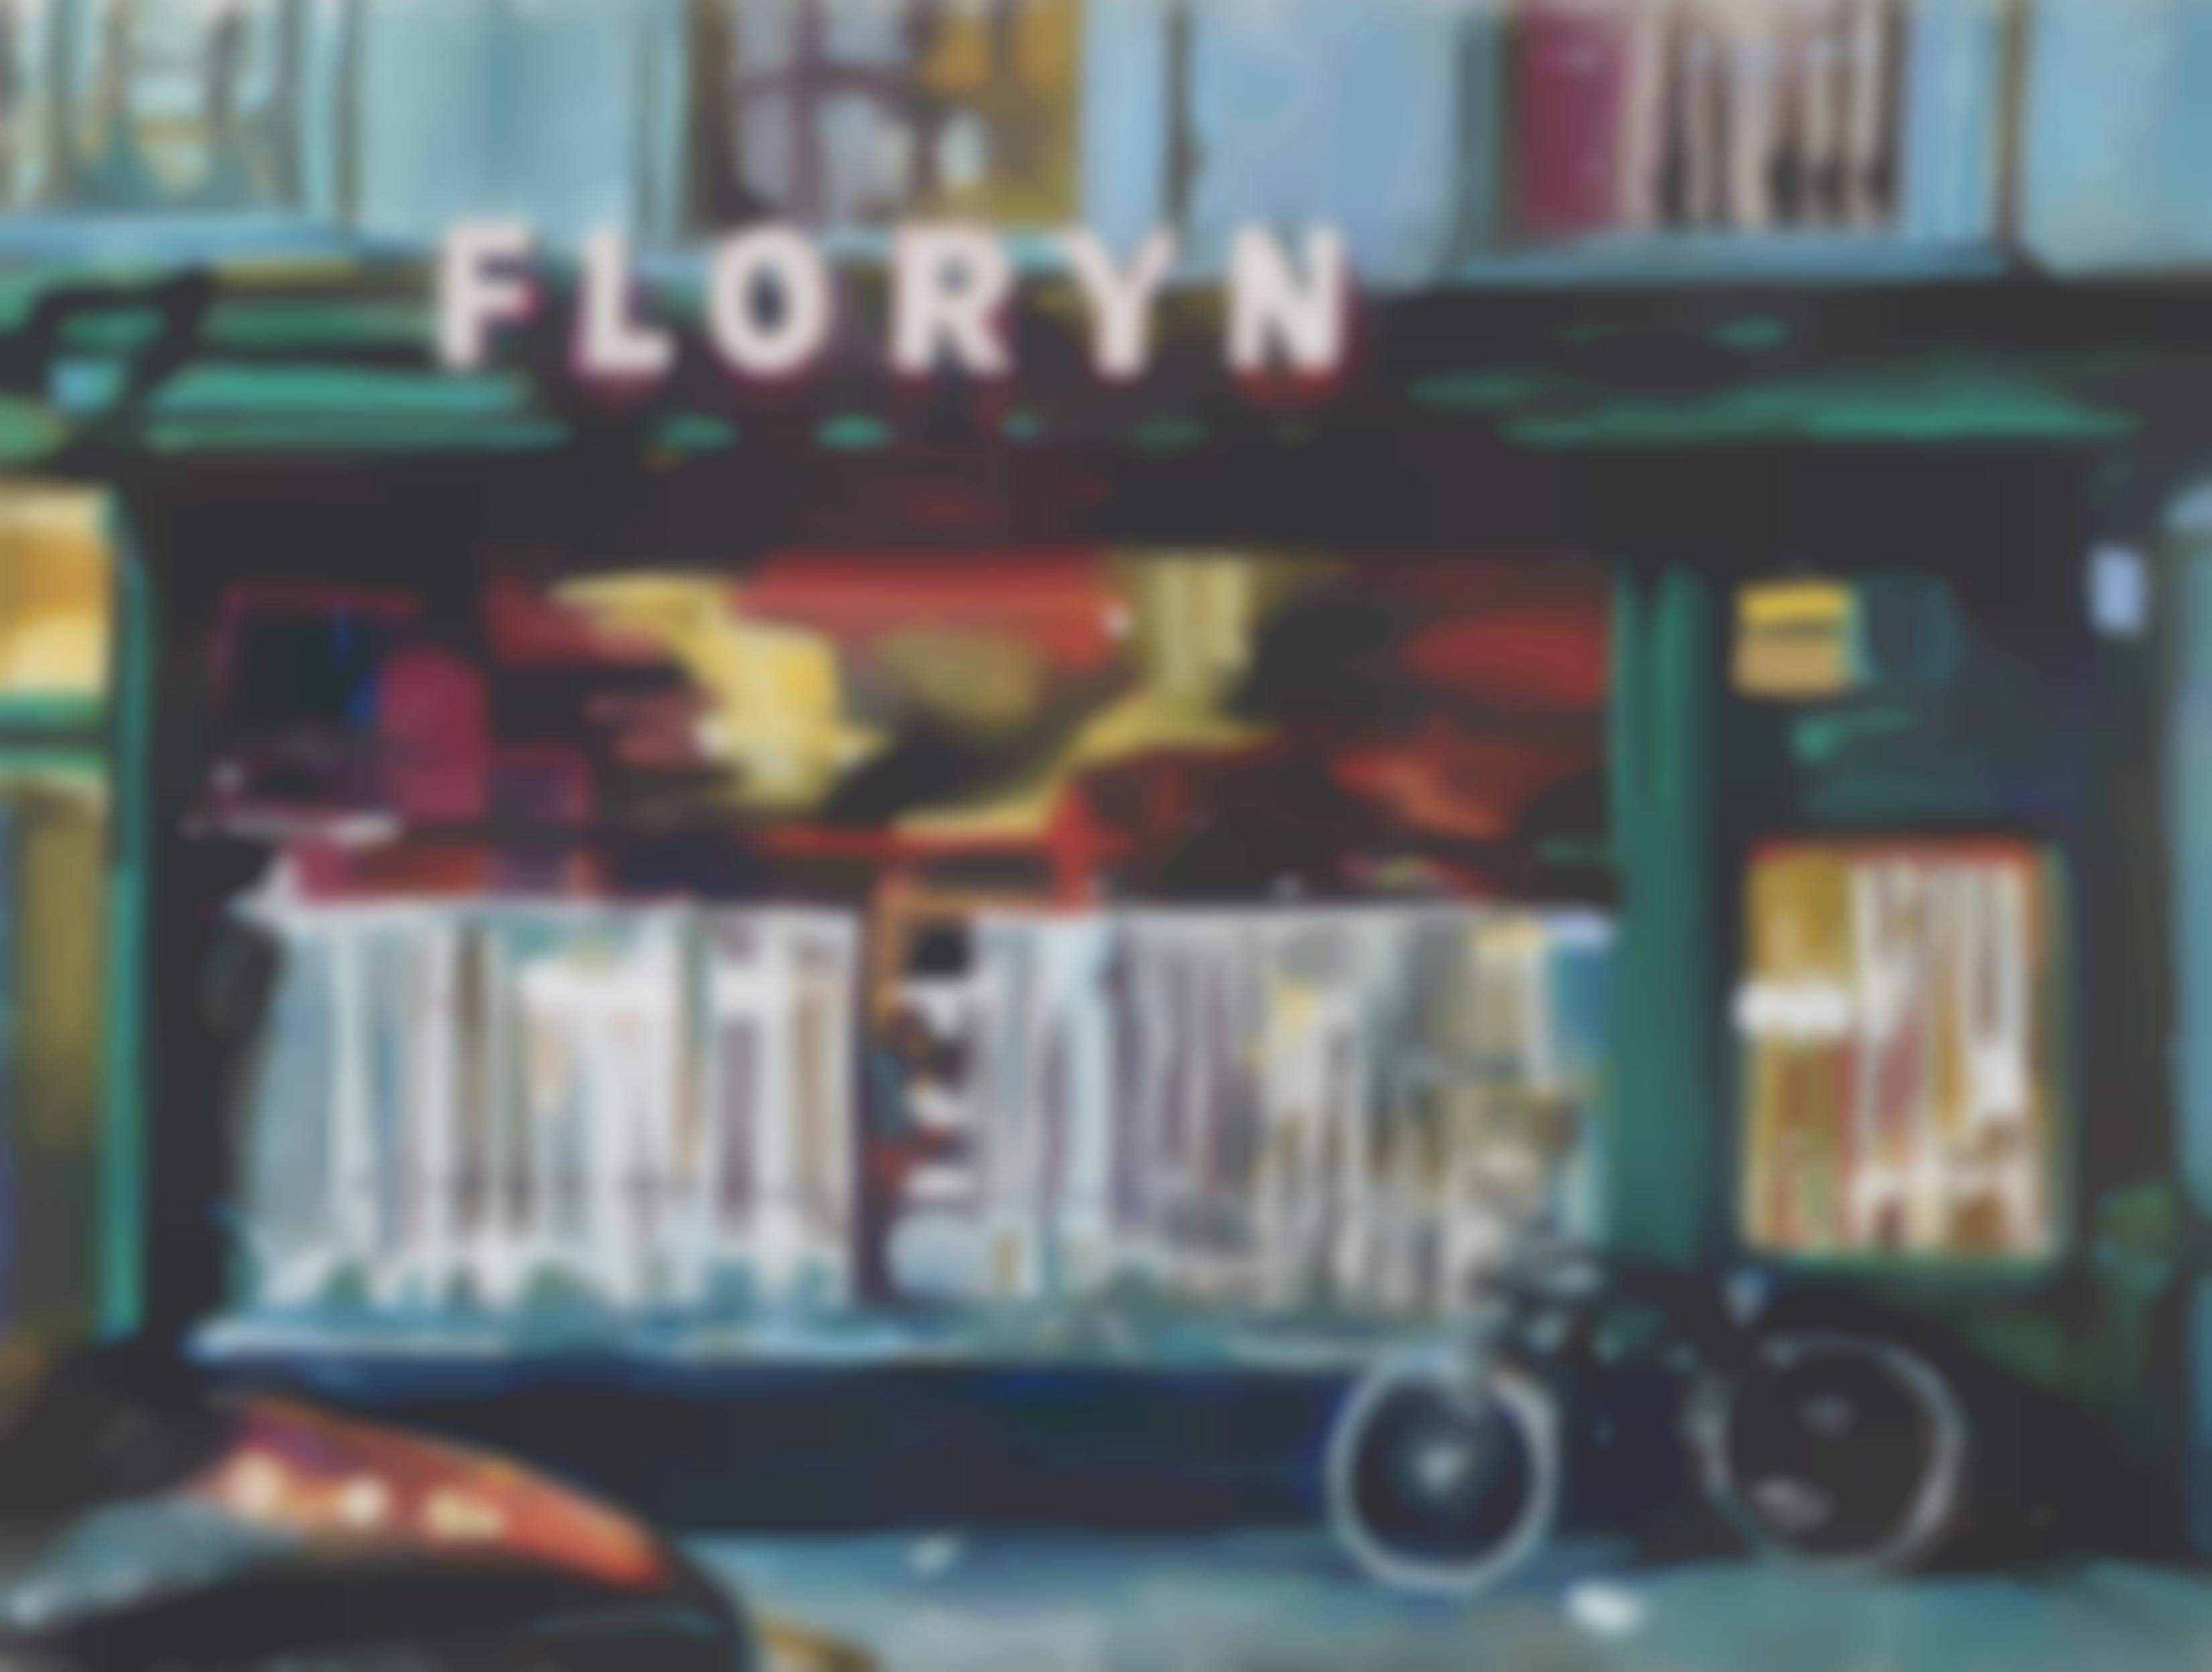 Hans-Peter Muller - Floryn-1990